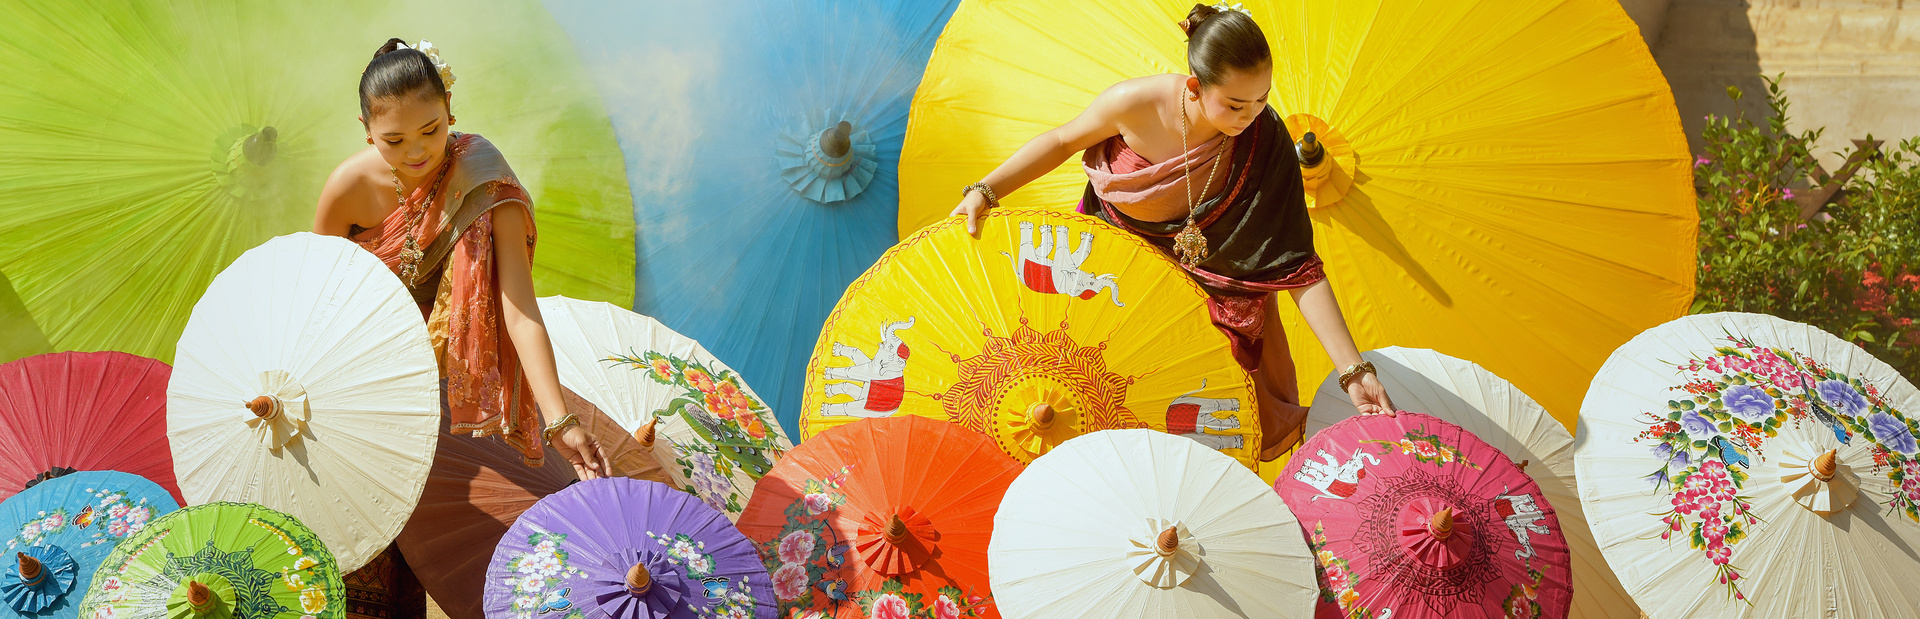 South East Asia news photo